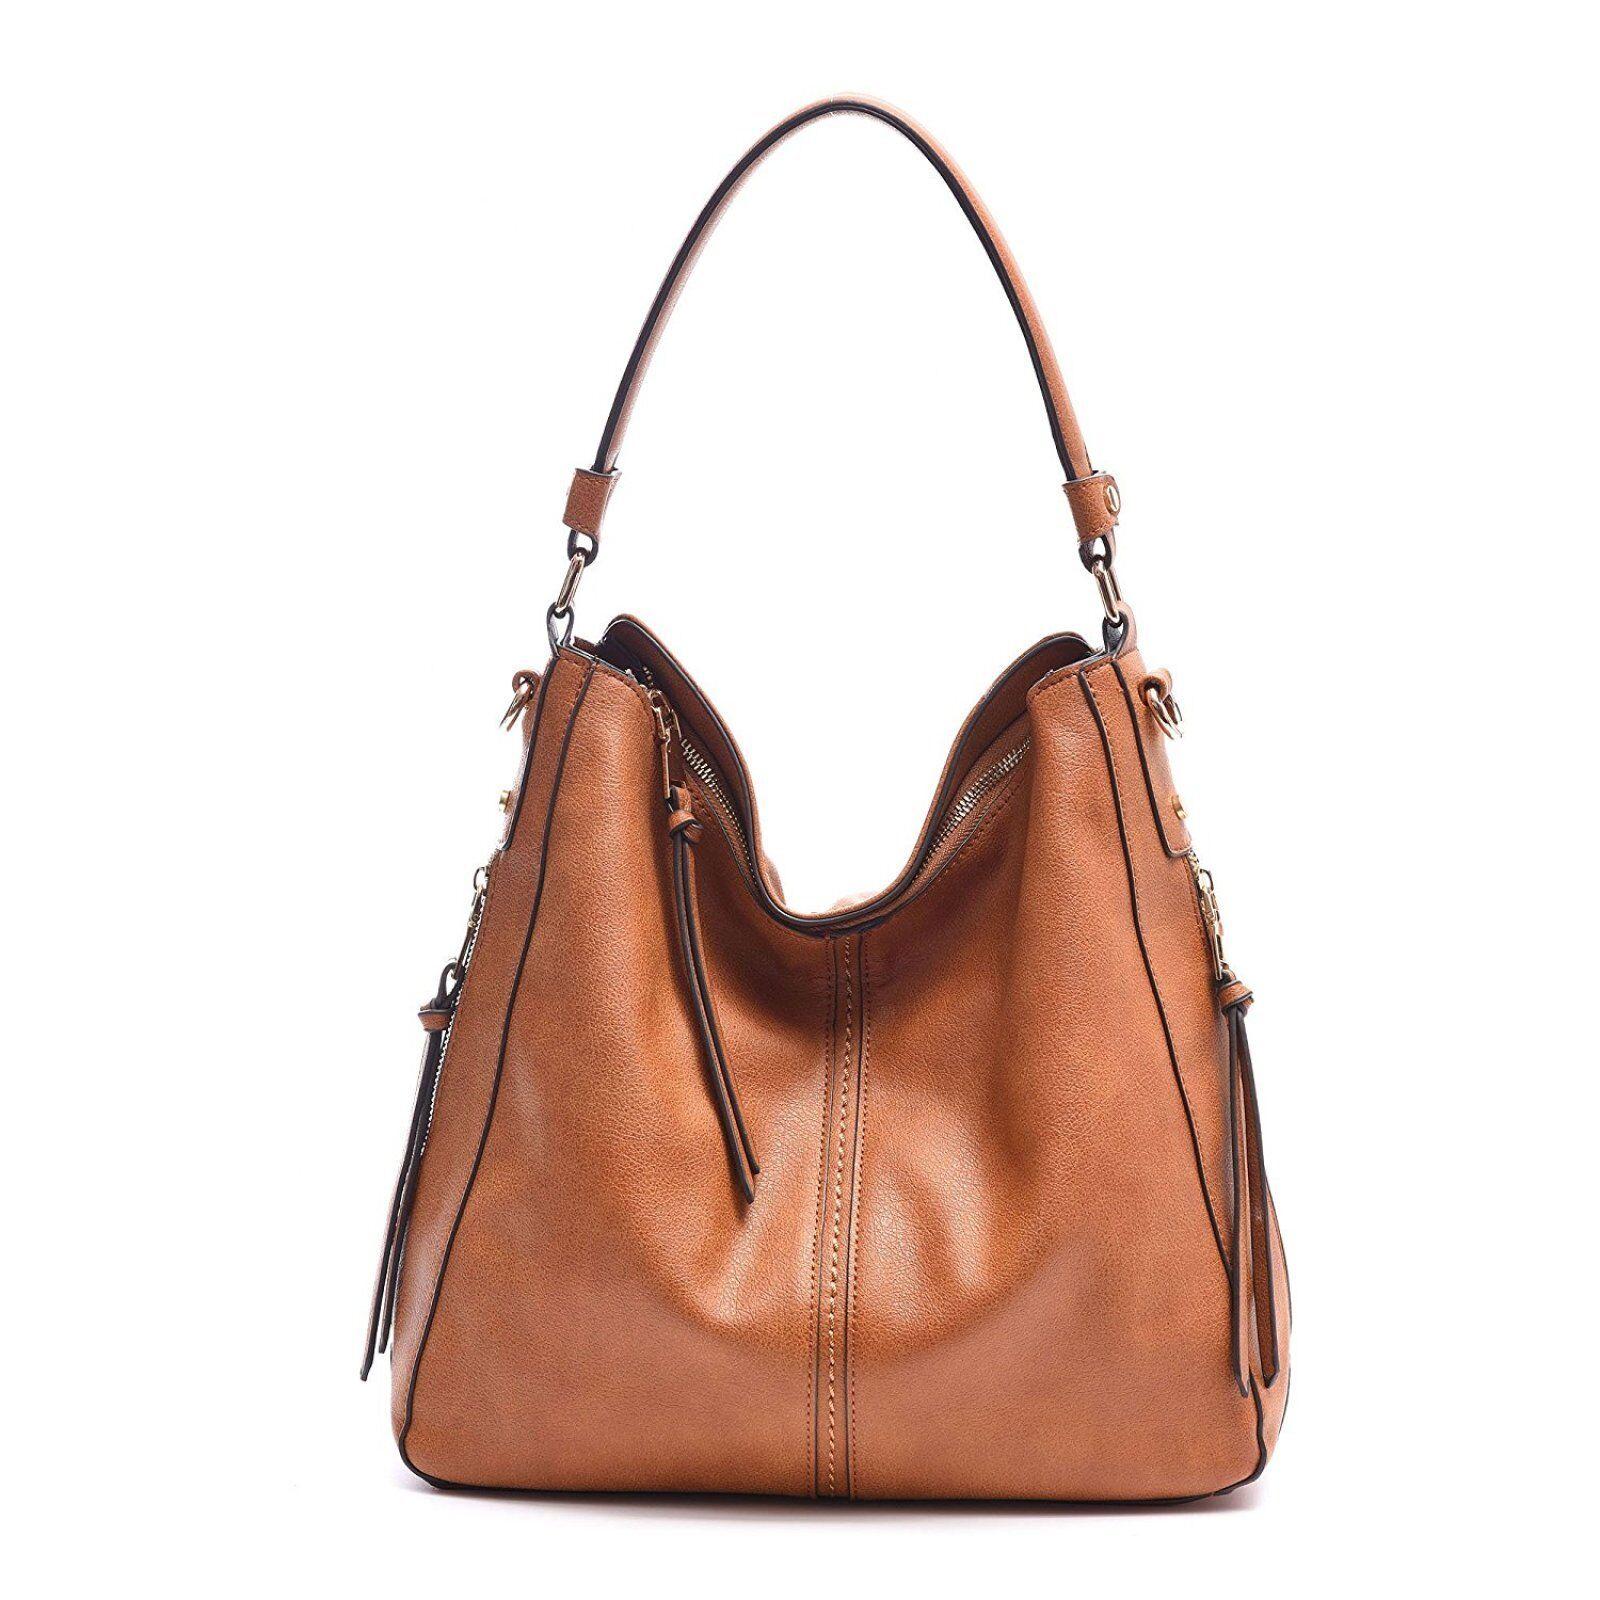 DDDH Vintage Hobo Handbags Shoulder Bags Durable Leather Tot